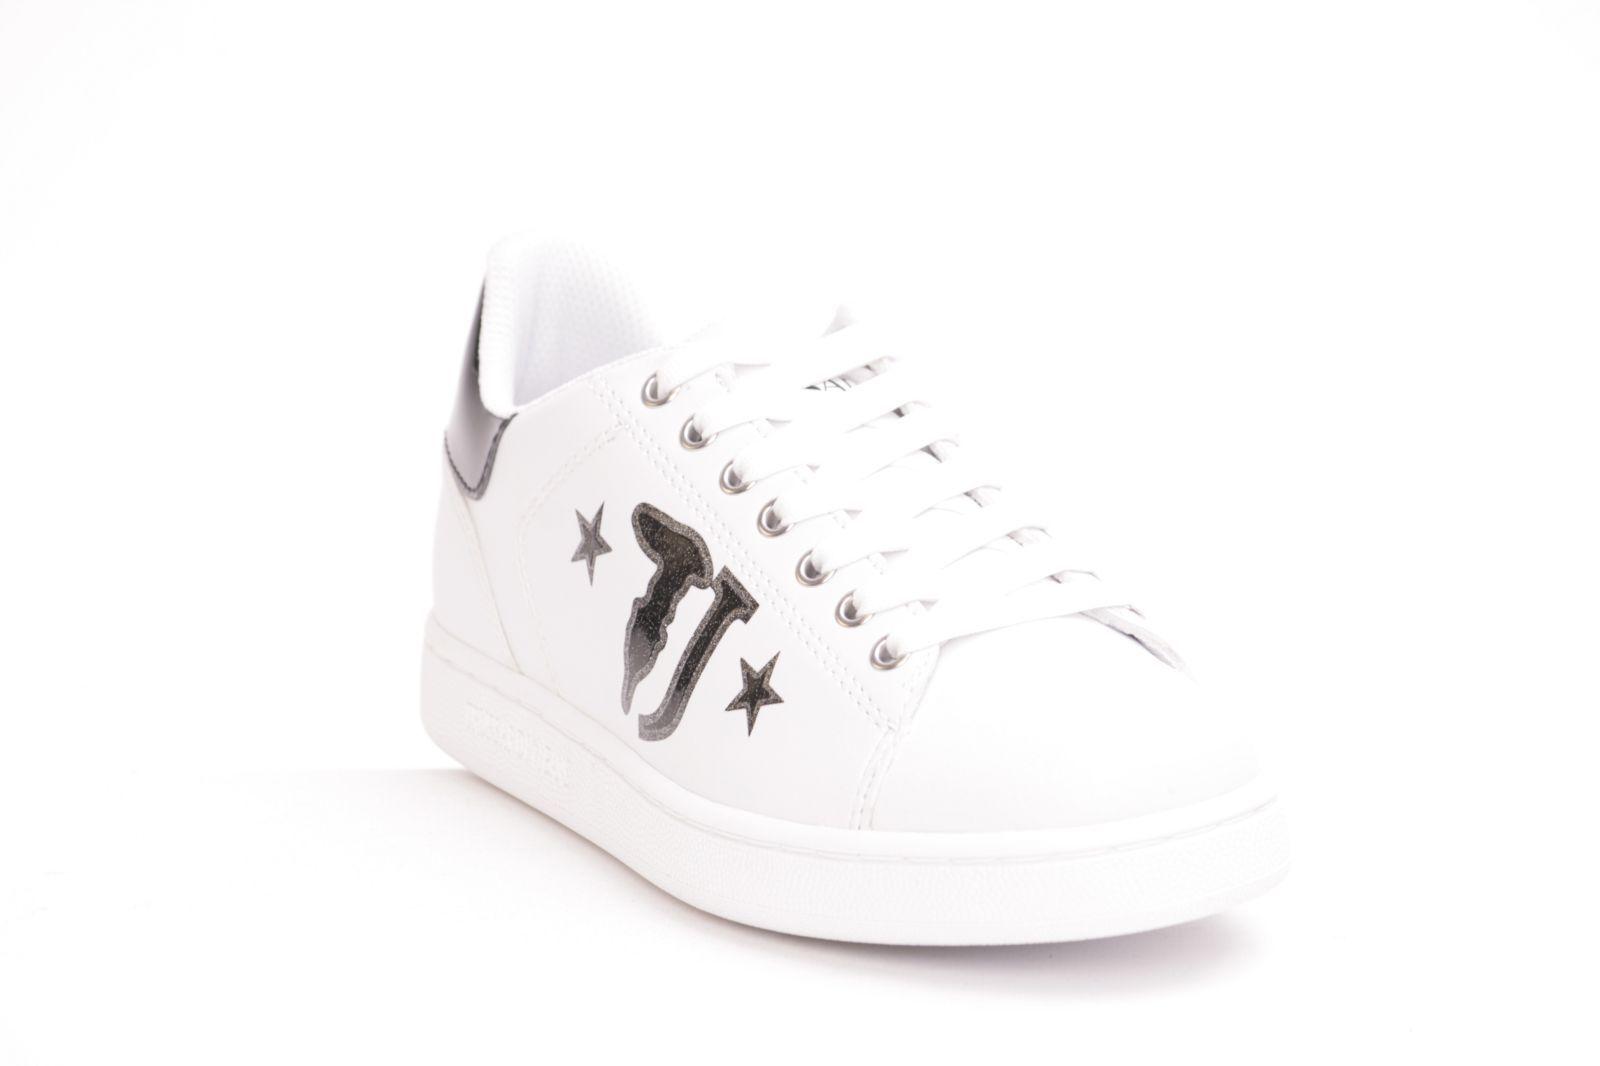 Jeans Trussardi Trussardi SneakersChaussures De SneakersChaussures De Jeans LMVSqUzGp